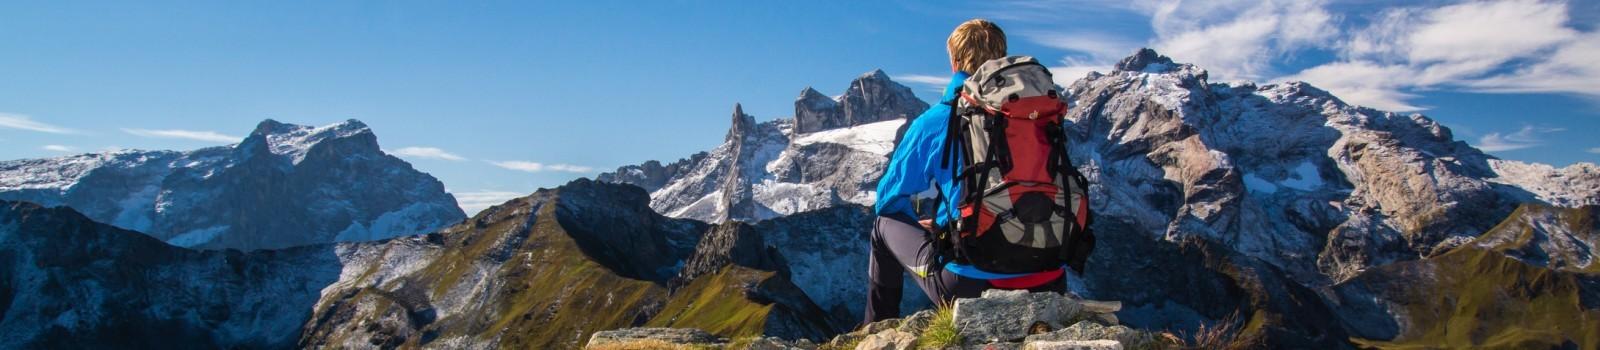 Bergwandern in Berchtesgaden